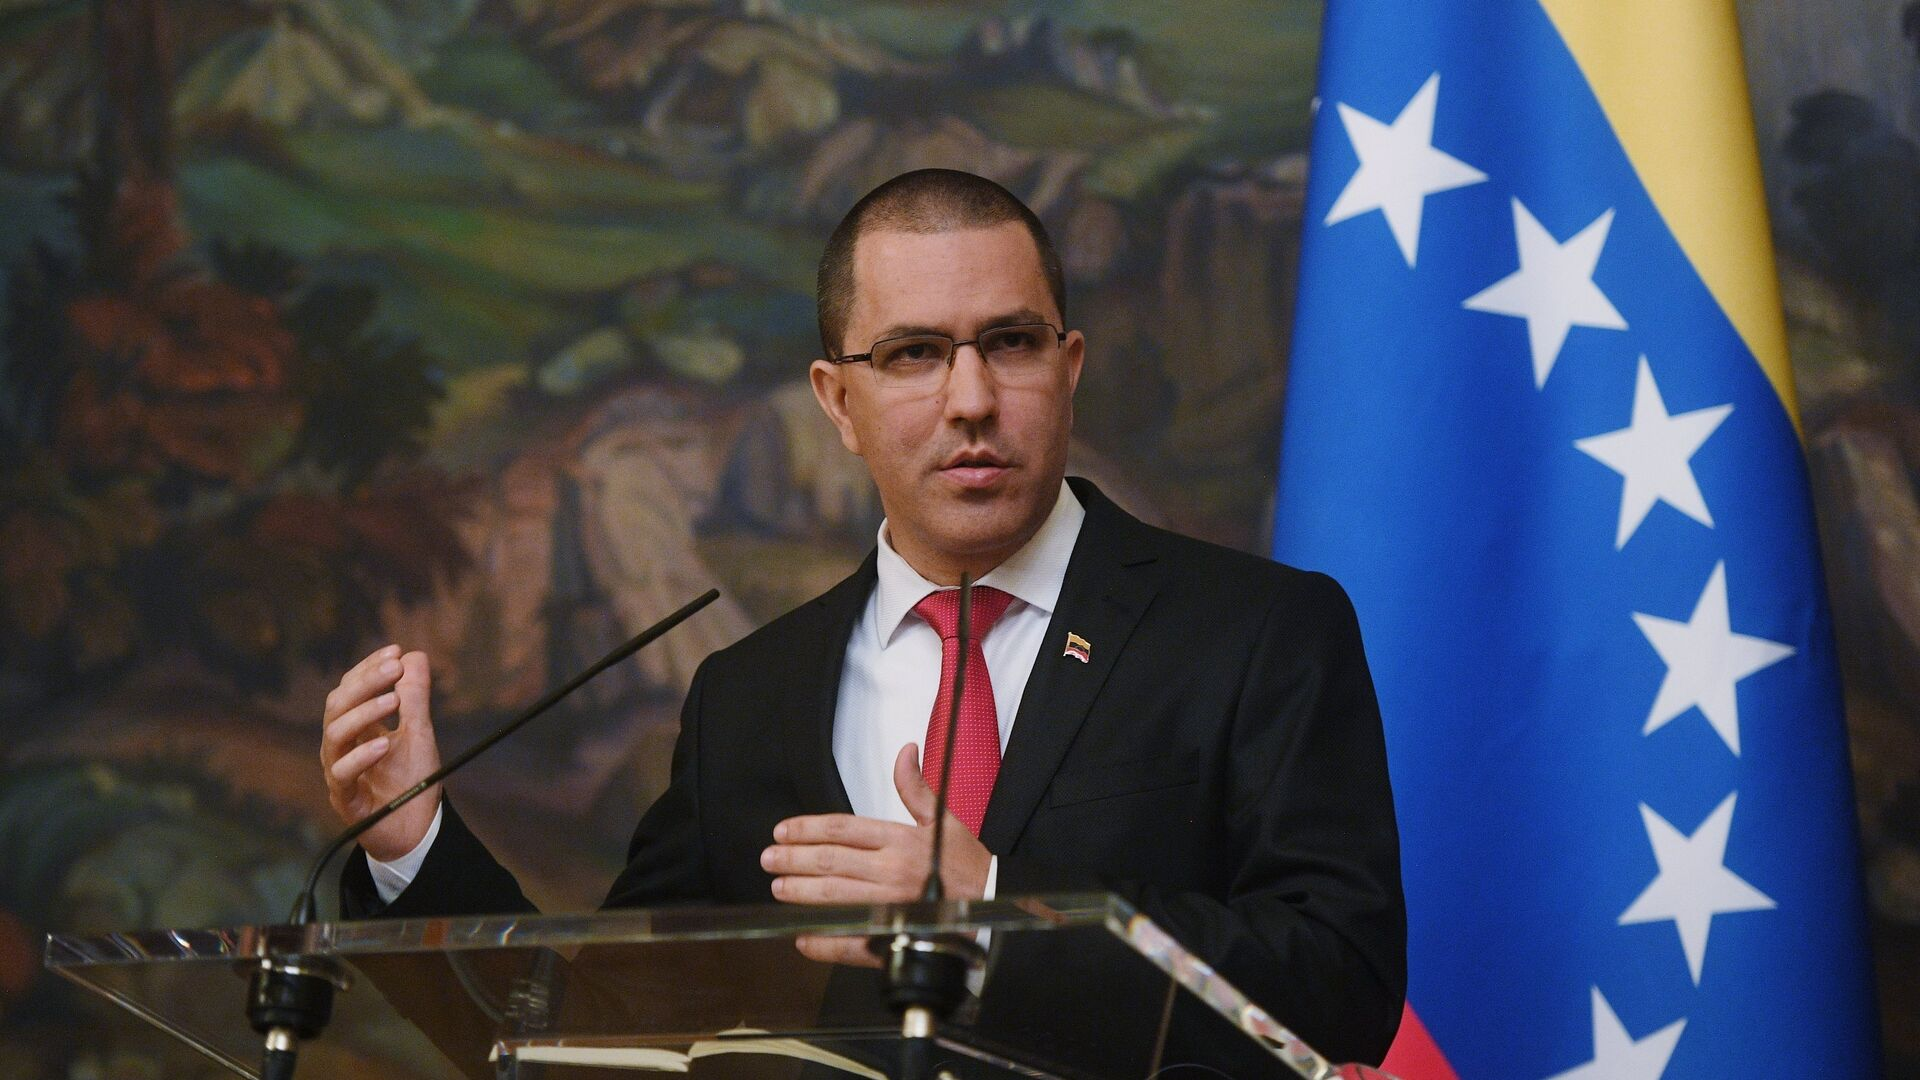 Jorge Arreaza, canciller de Venezuela - Sputnik Mundo, 1920, 09.08.2021